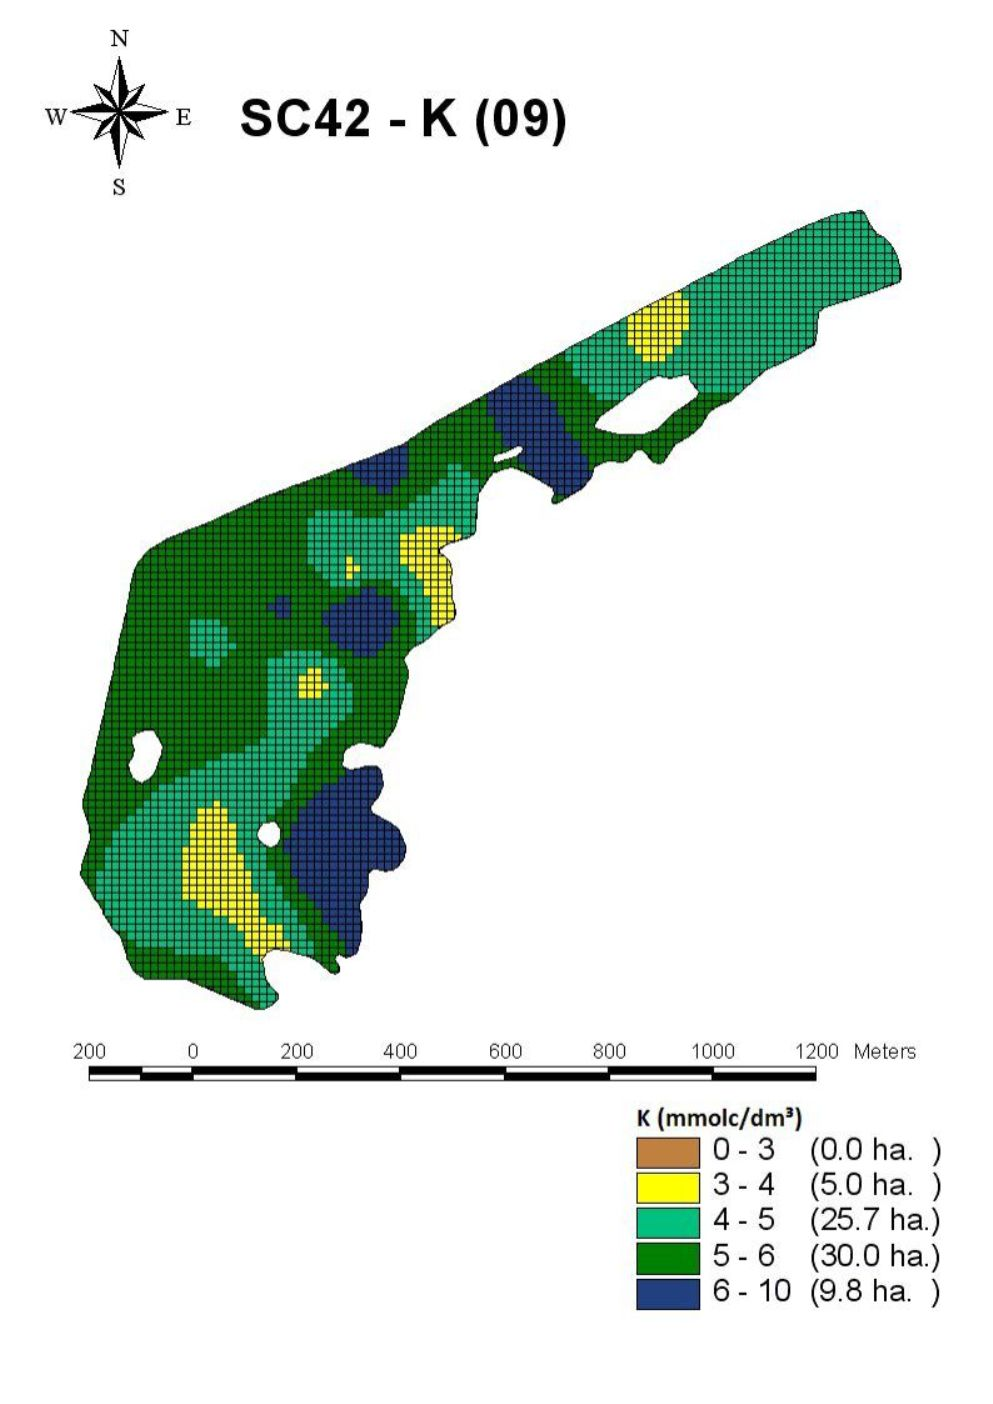 K - 2009 - Talhão SC42 - Fazenda Santa Clara - Tibagi-Pr